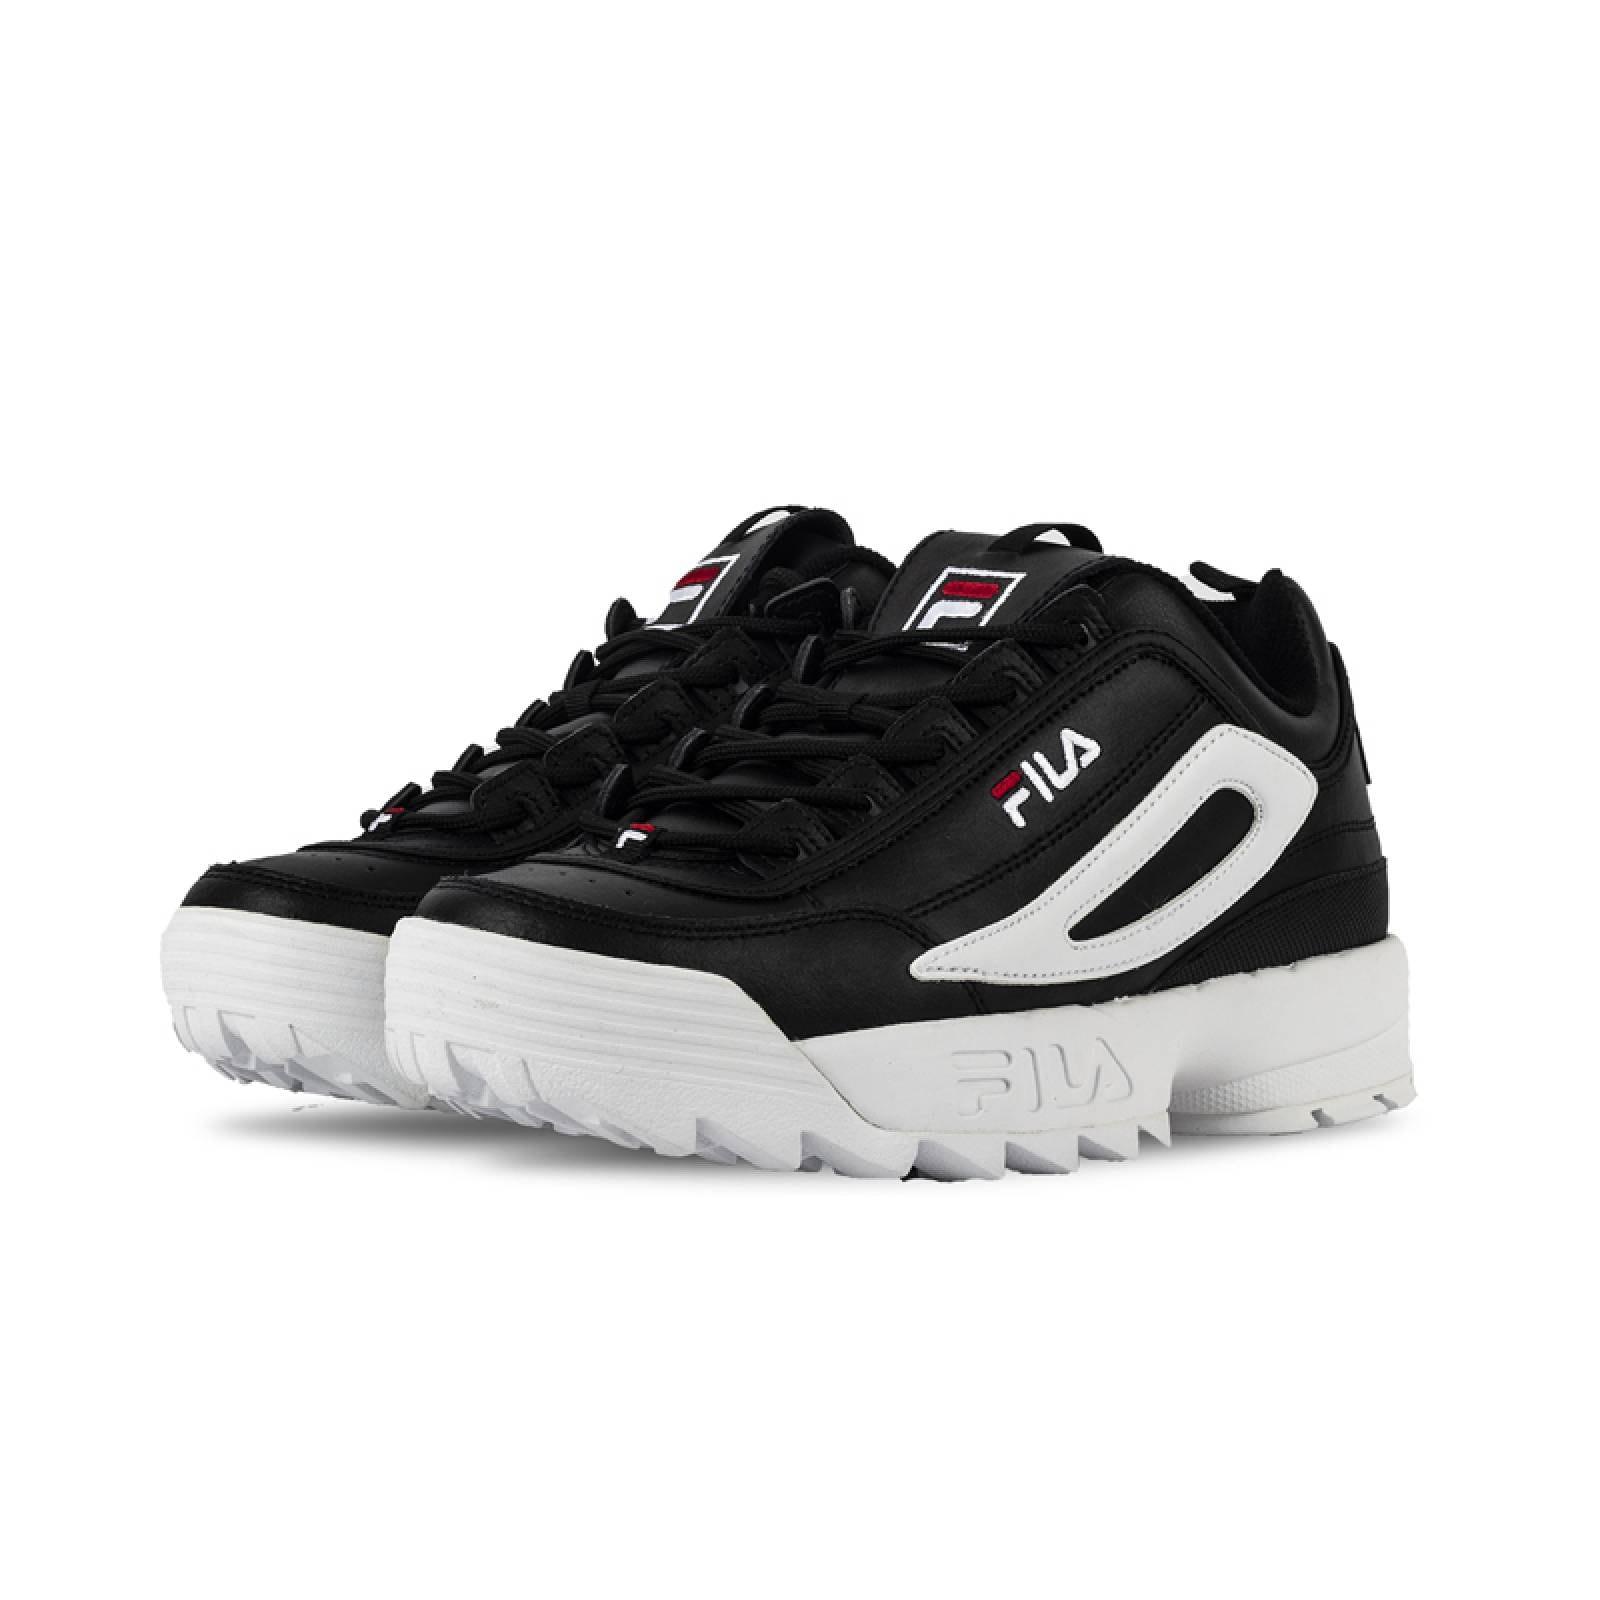 TENIS FILA DISRUPTOR II XL BLACK / WHITE / RED